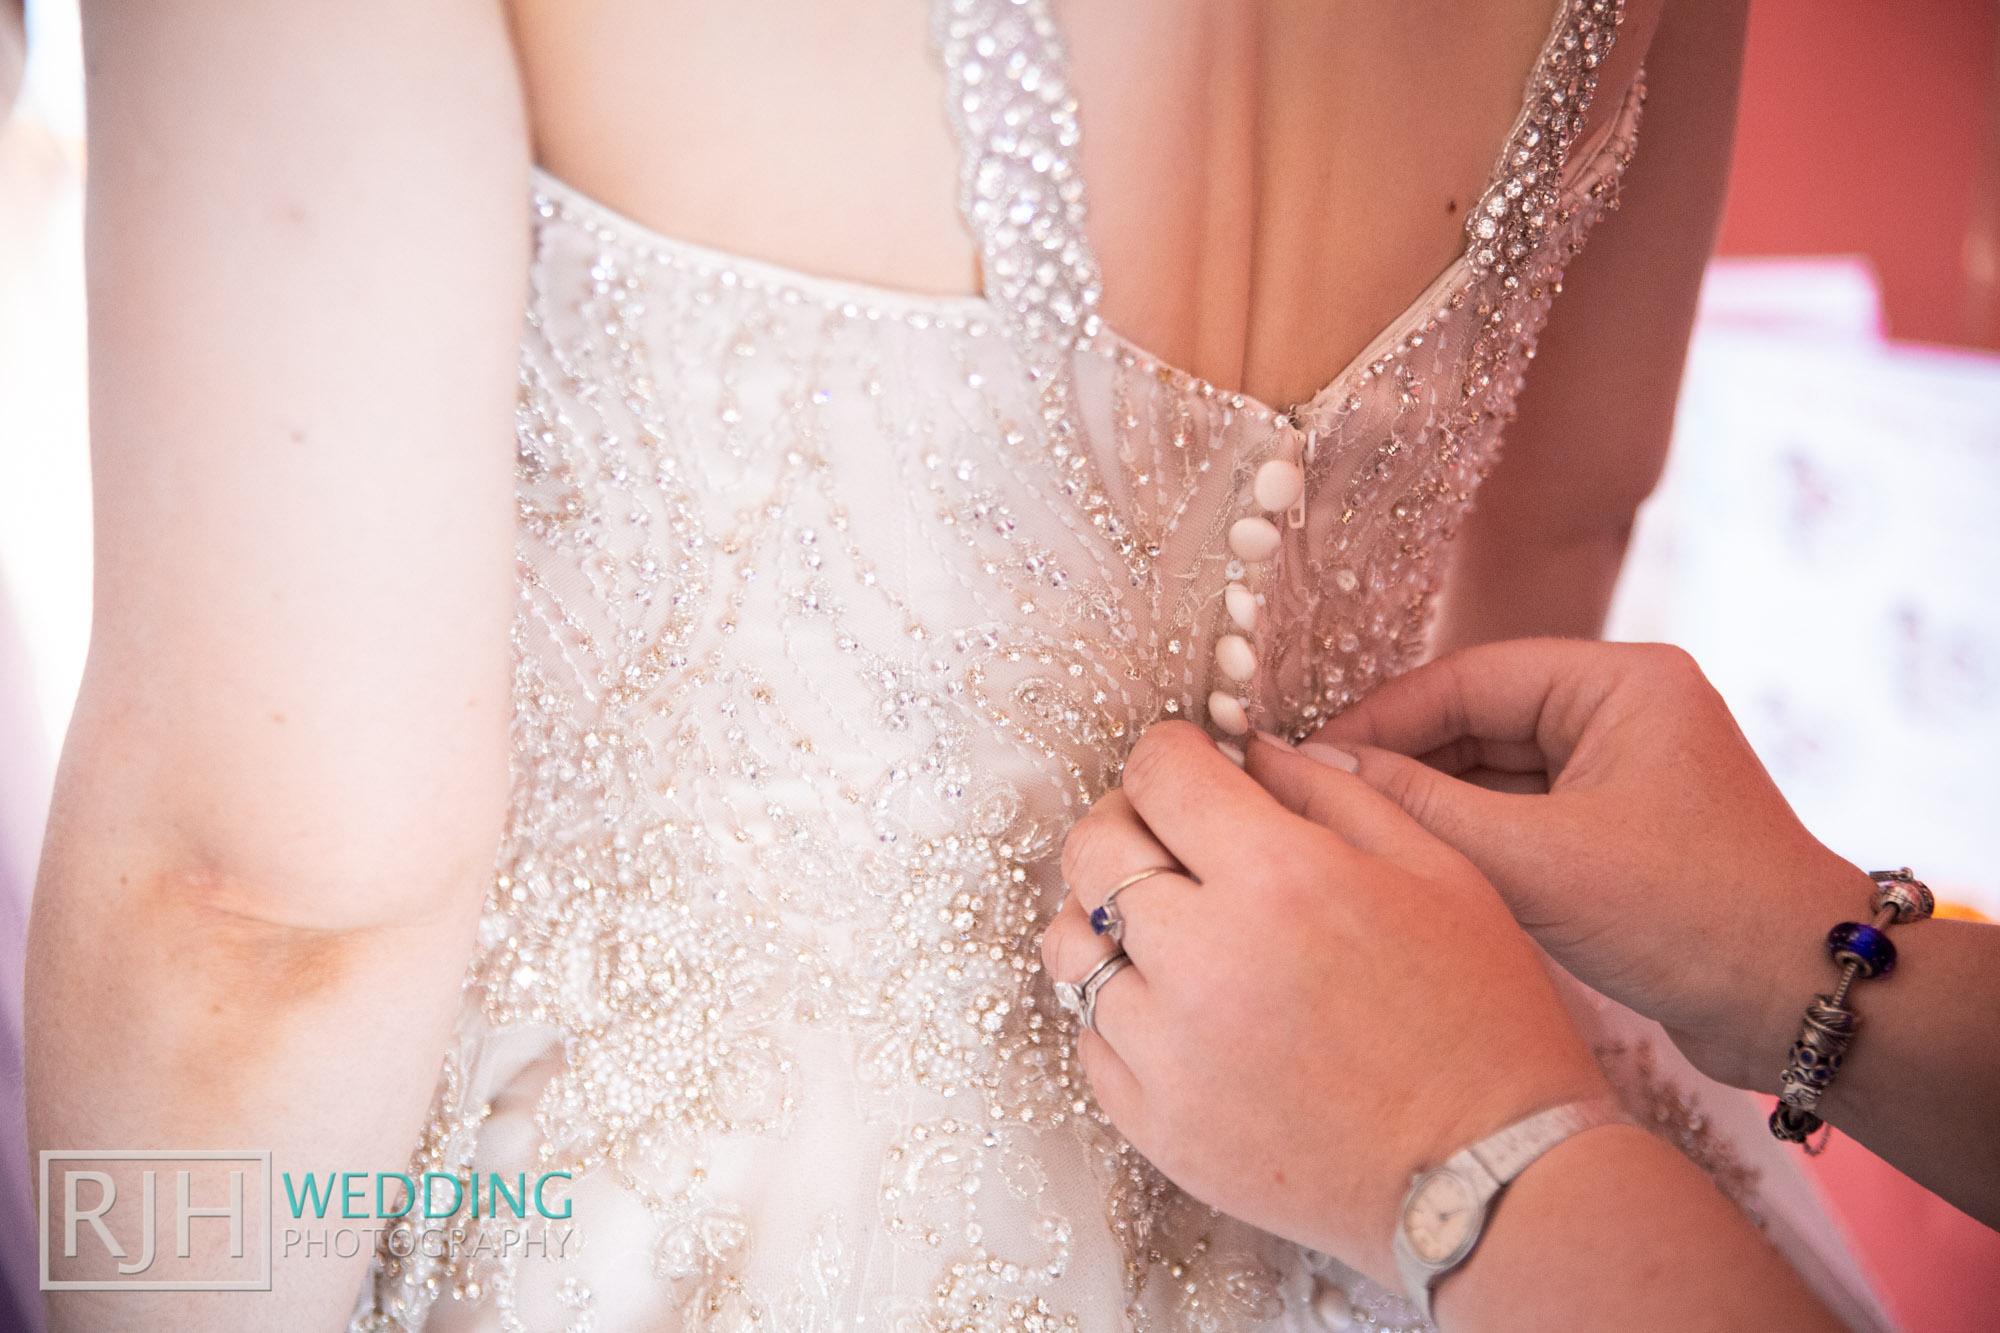 Oulton Hall Wedding Photography_Goodwill-Hall_013_IMG_6354.jpg